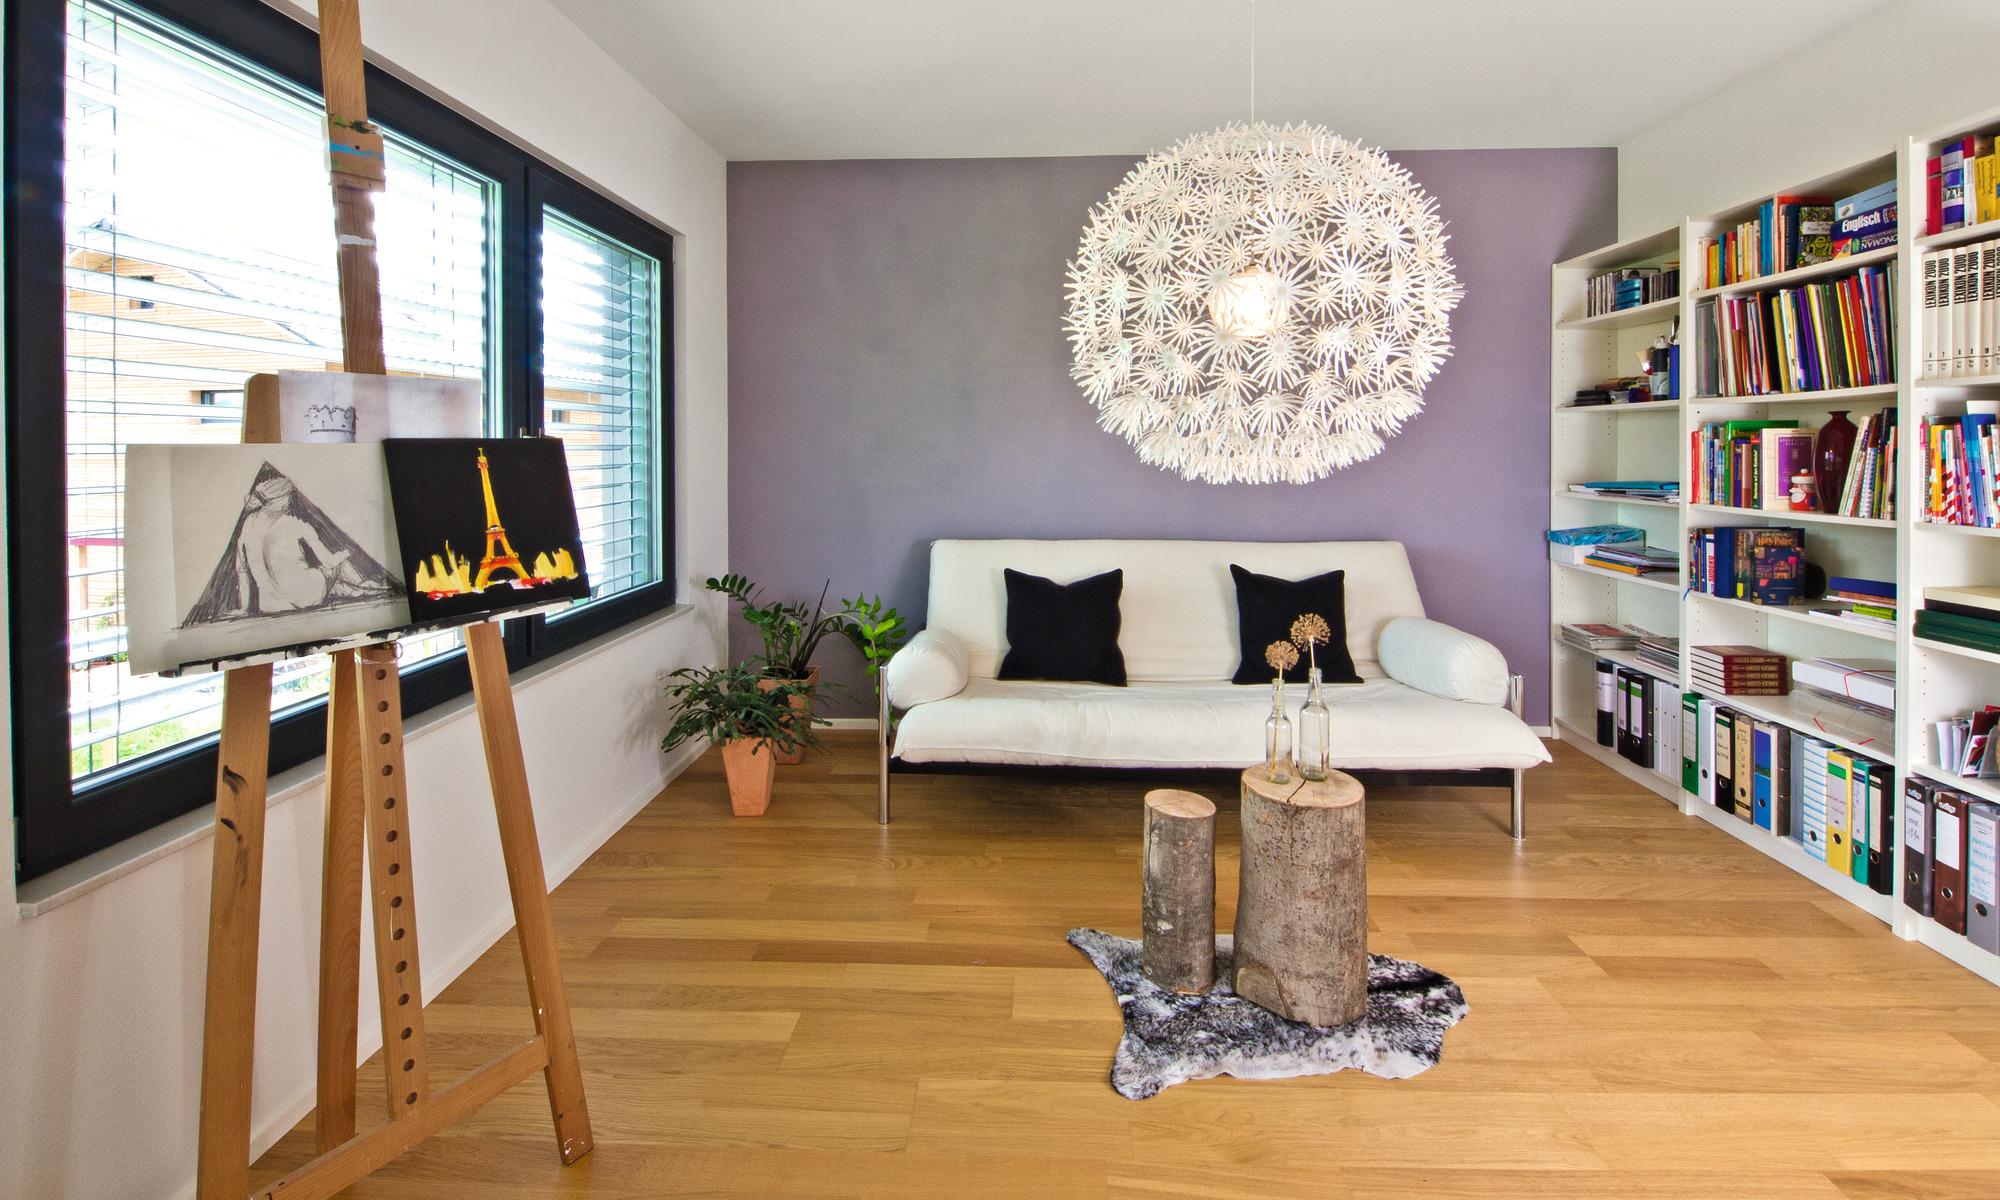 Modern eco-friendly self-build home